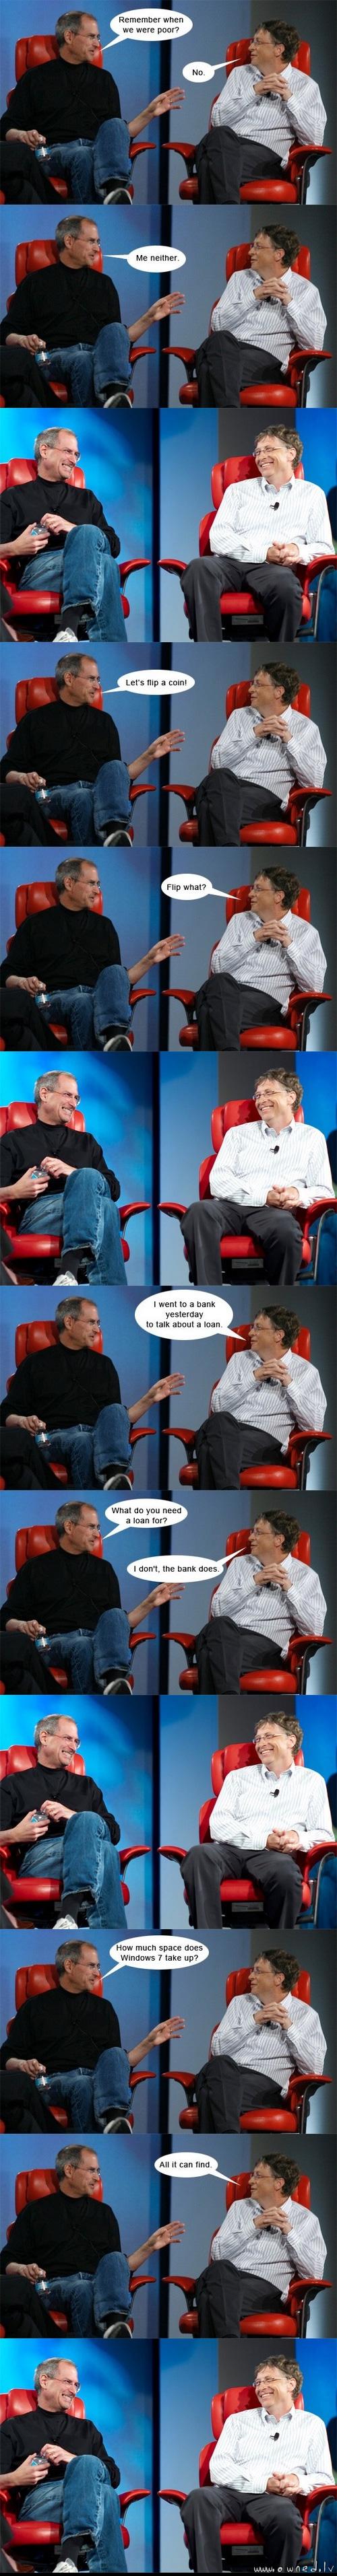 Steve and Bill